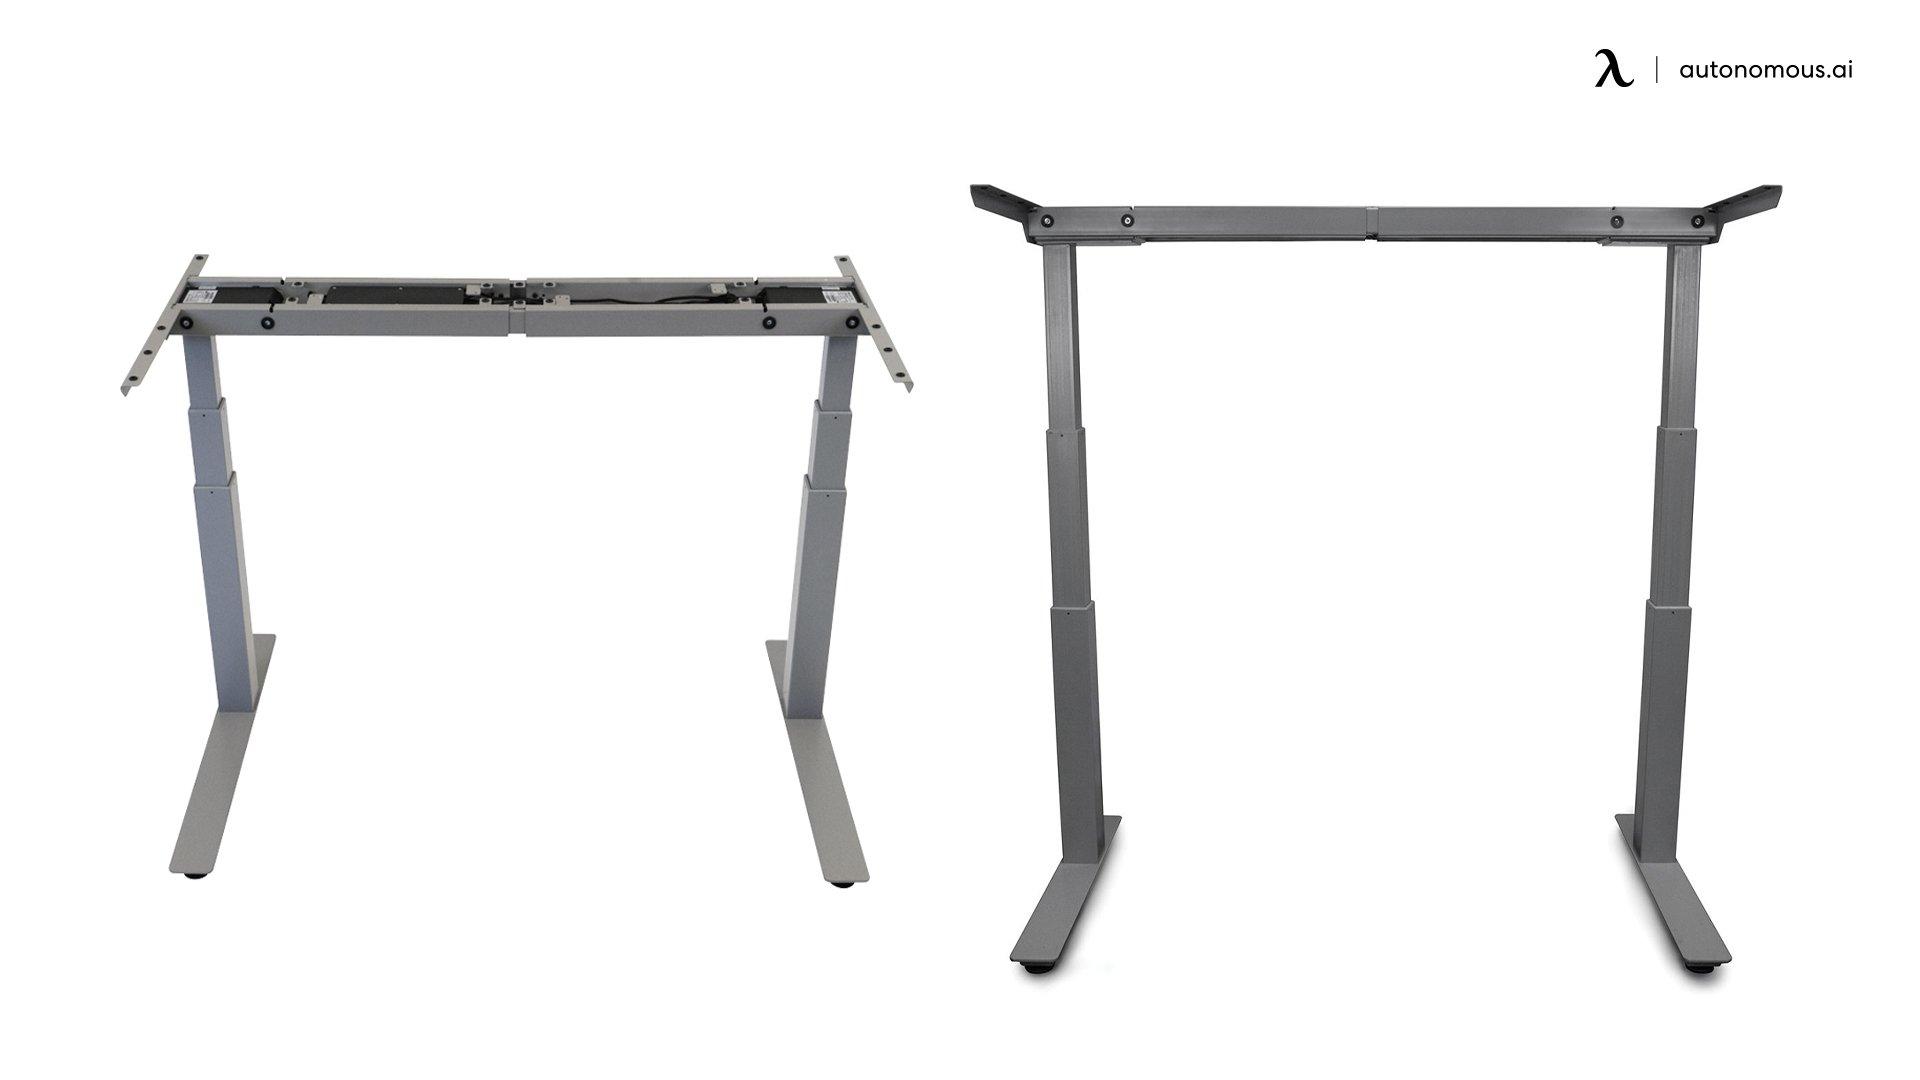 iMovR Vigor Heavy Duty DIY Standing Desk Base